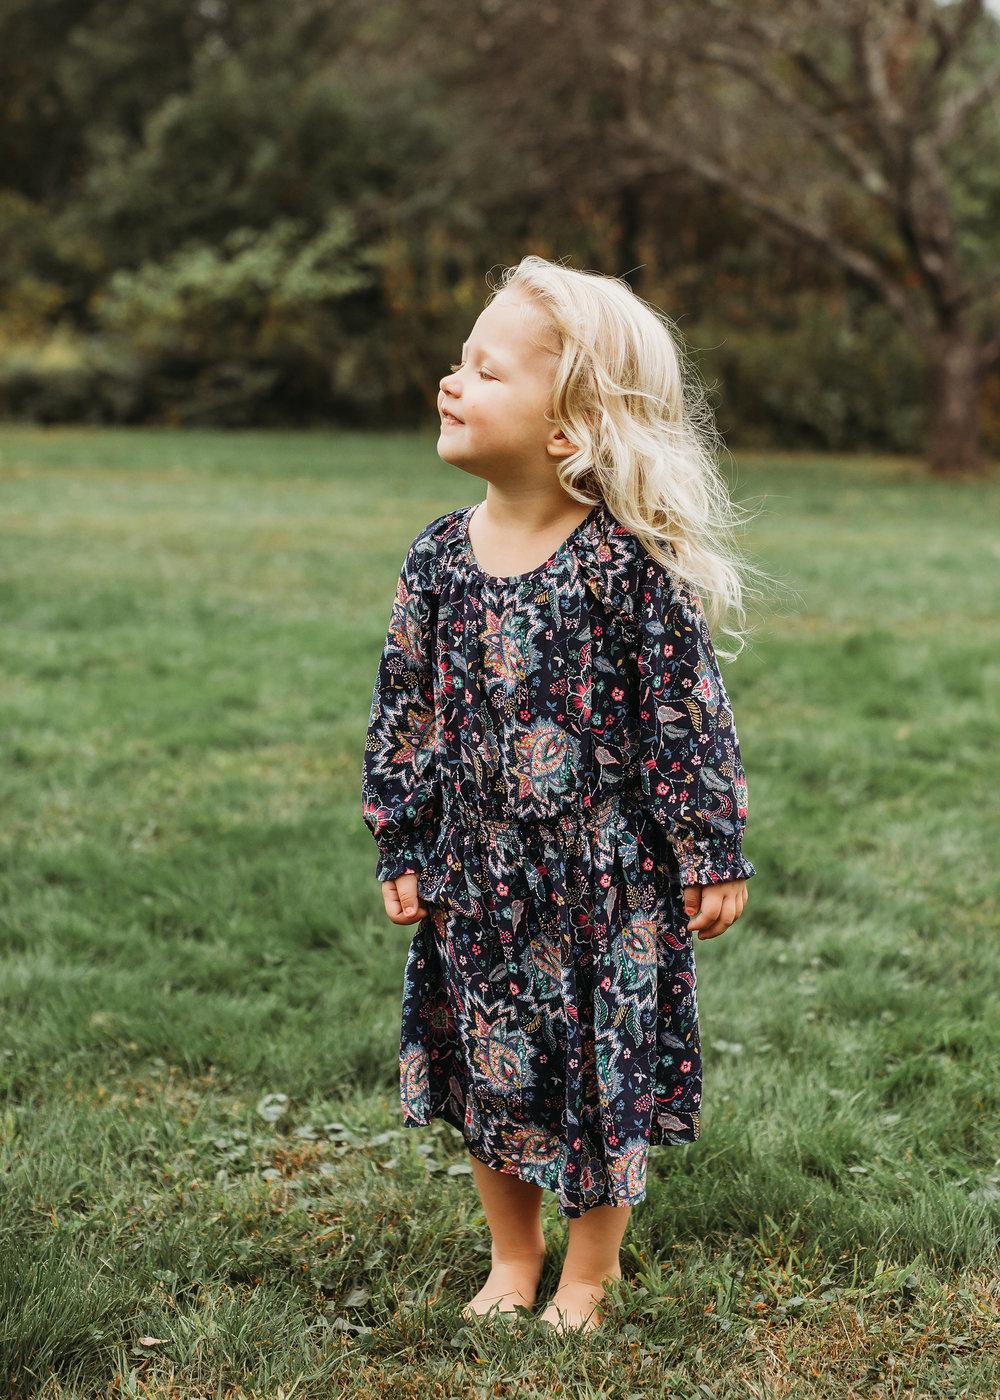 Toddler girl in boho dress for Sudbury family portraits. Boston family photographer, natural light, candid.